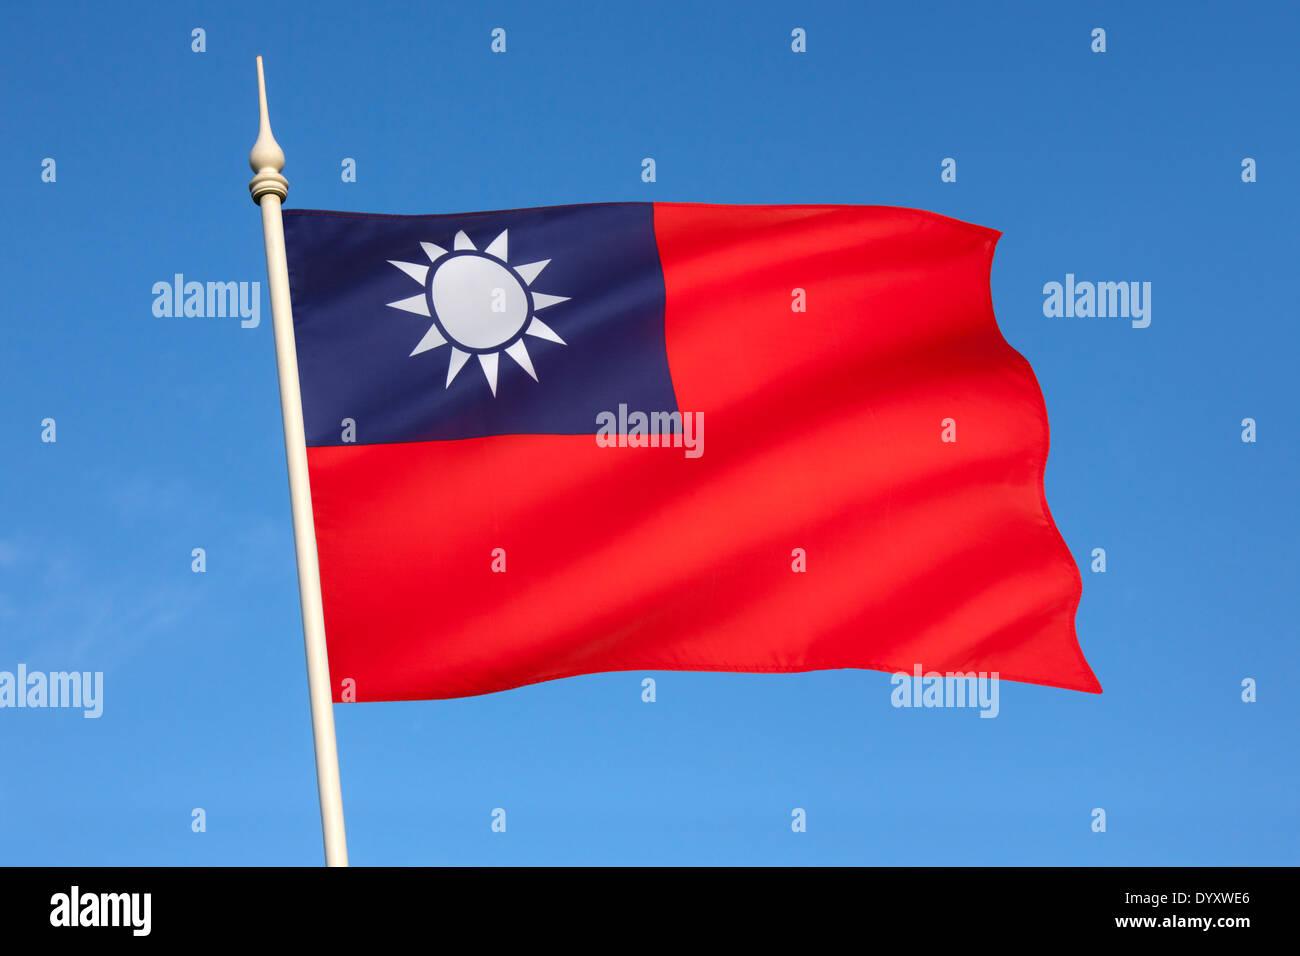 Flag of Taiwan - Stock Image